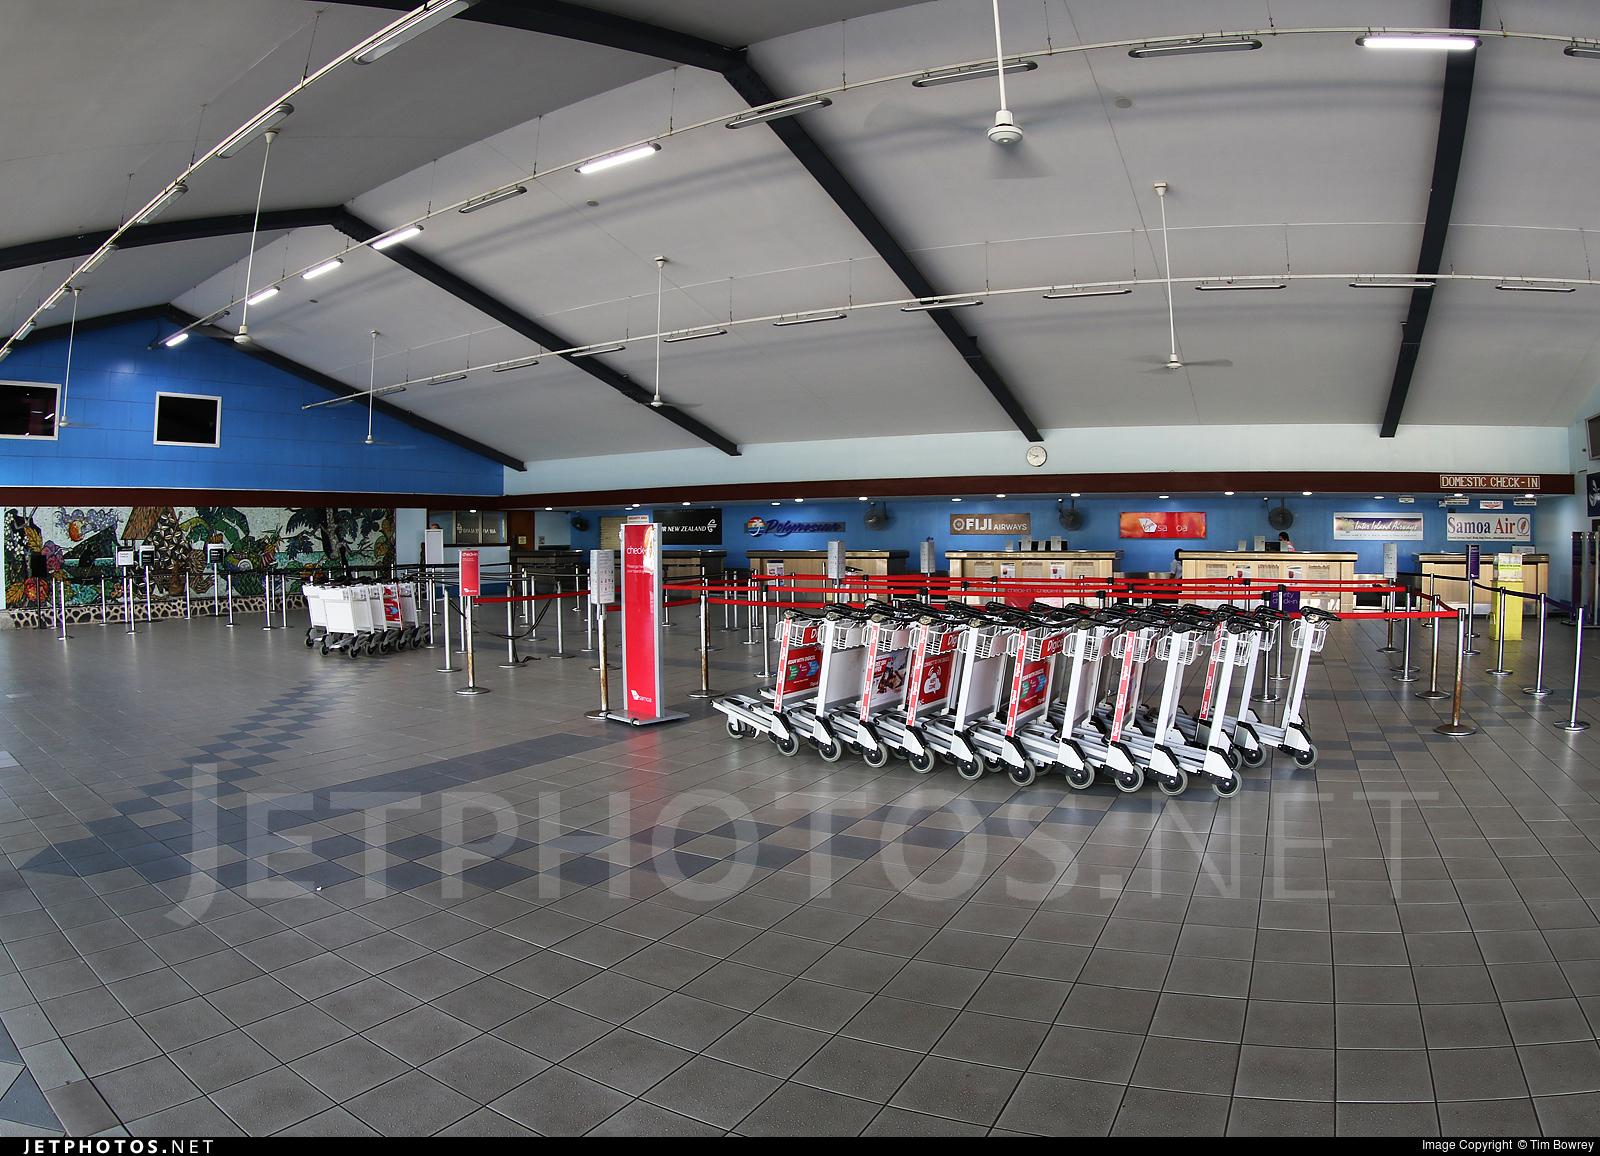 NSFA - Airport - Terminal